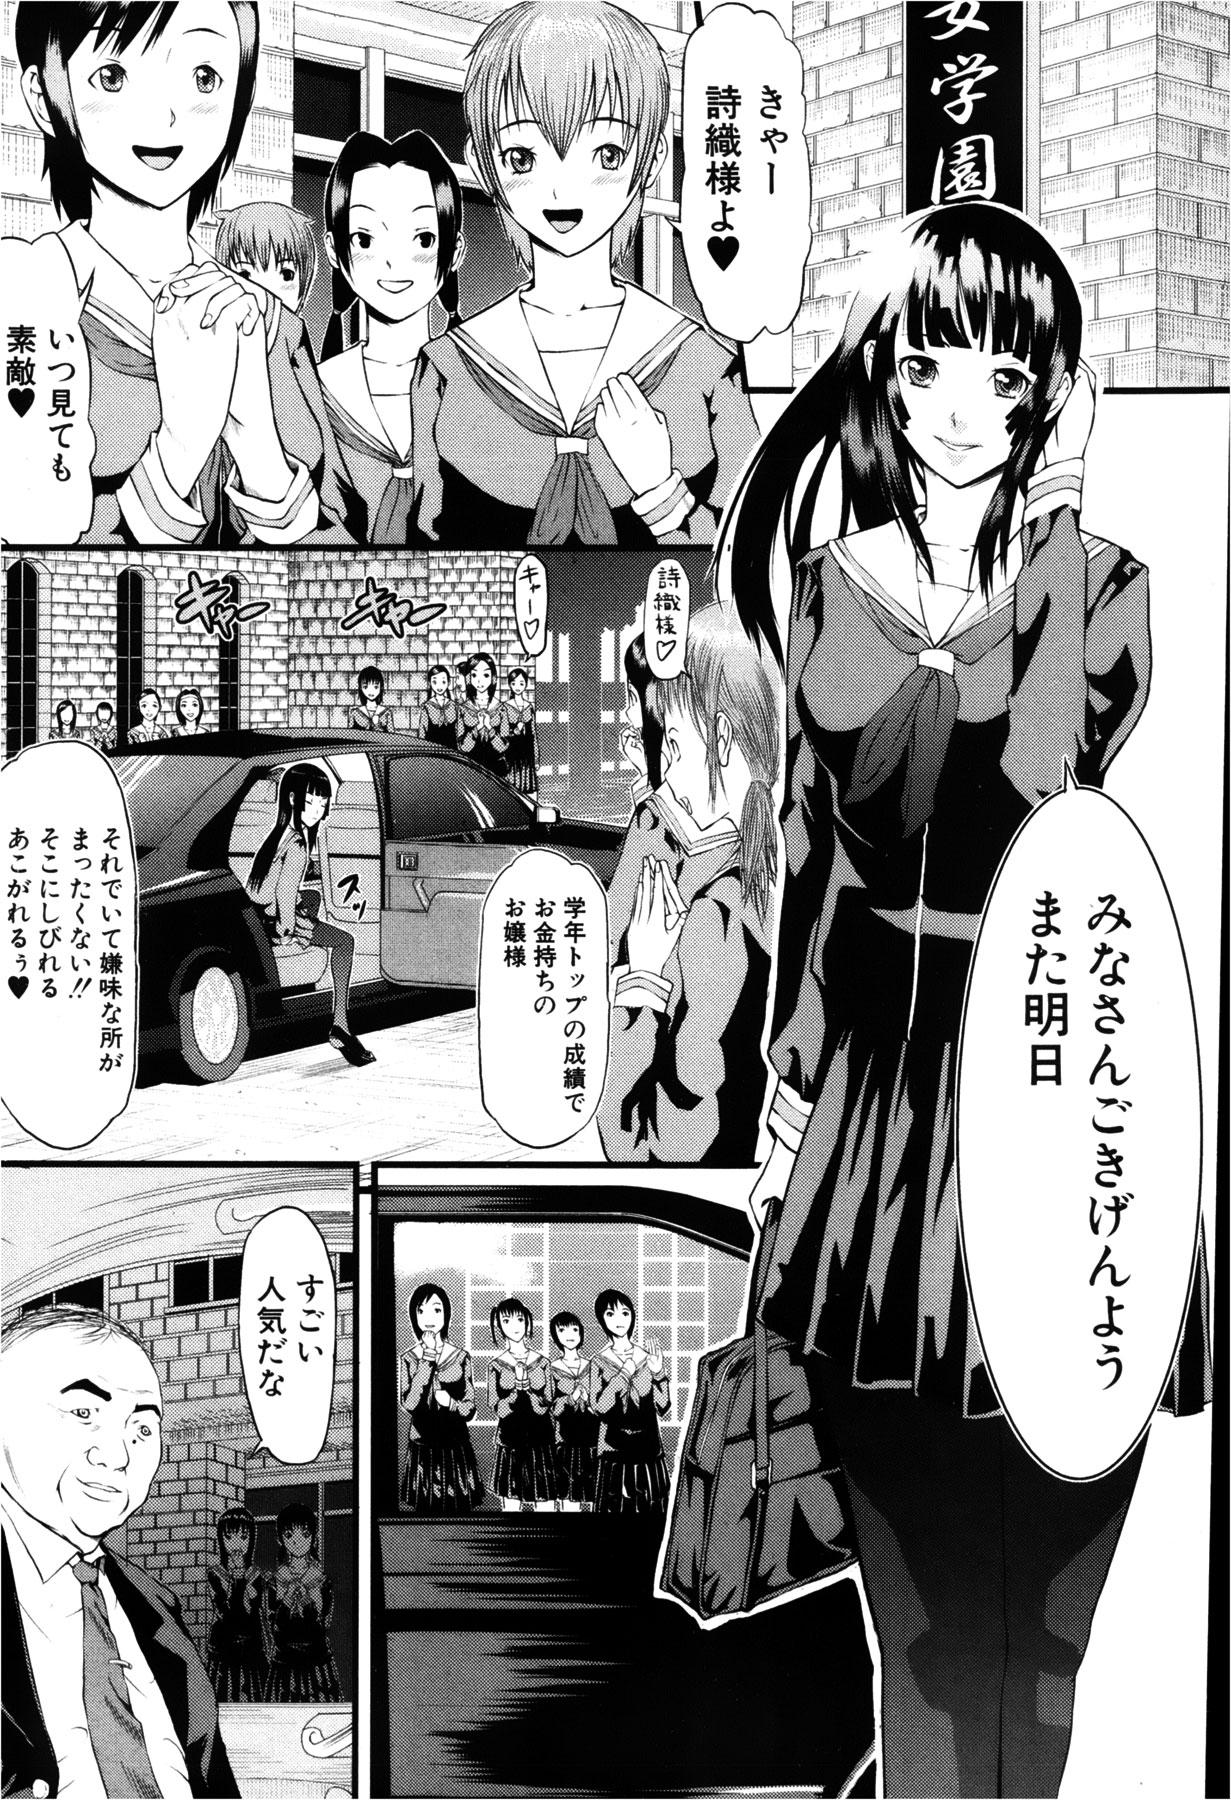 COMIC Shingeki 2013-02 304